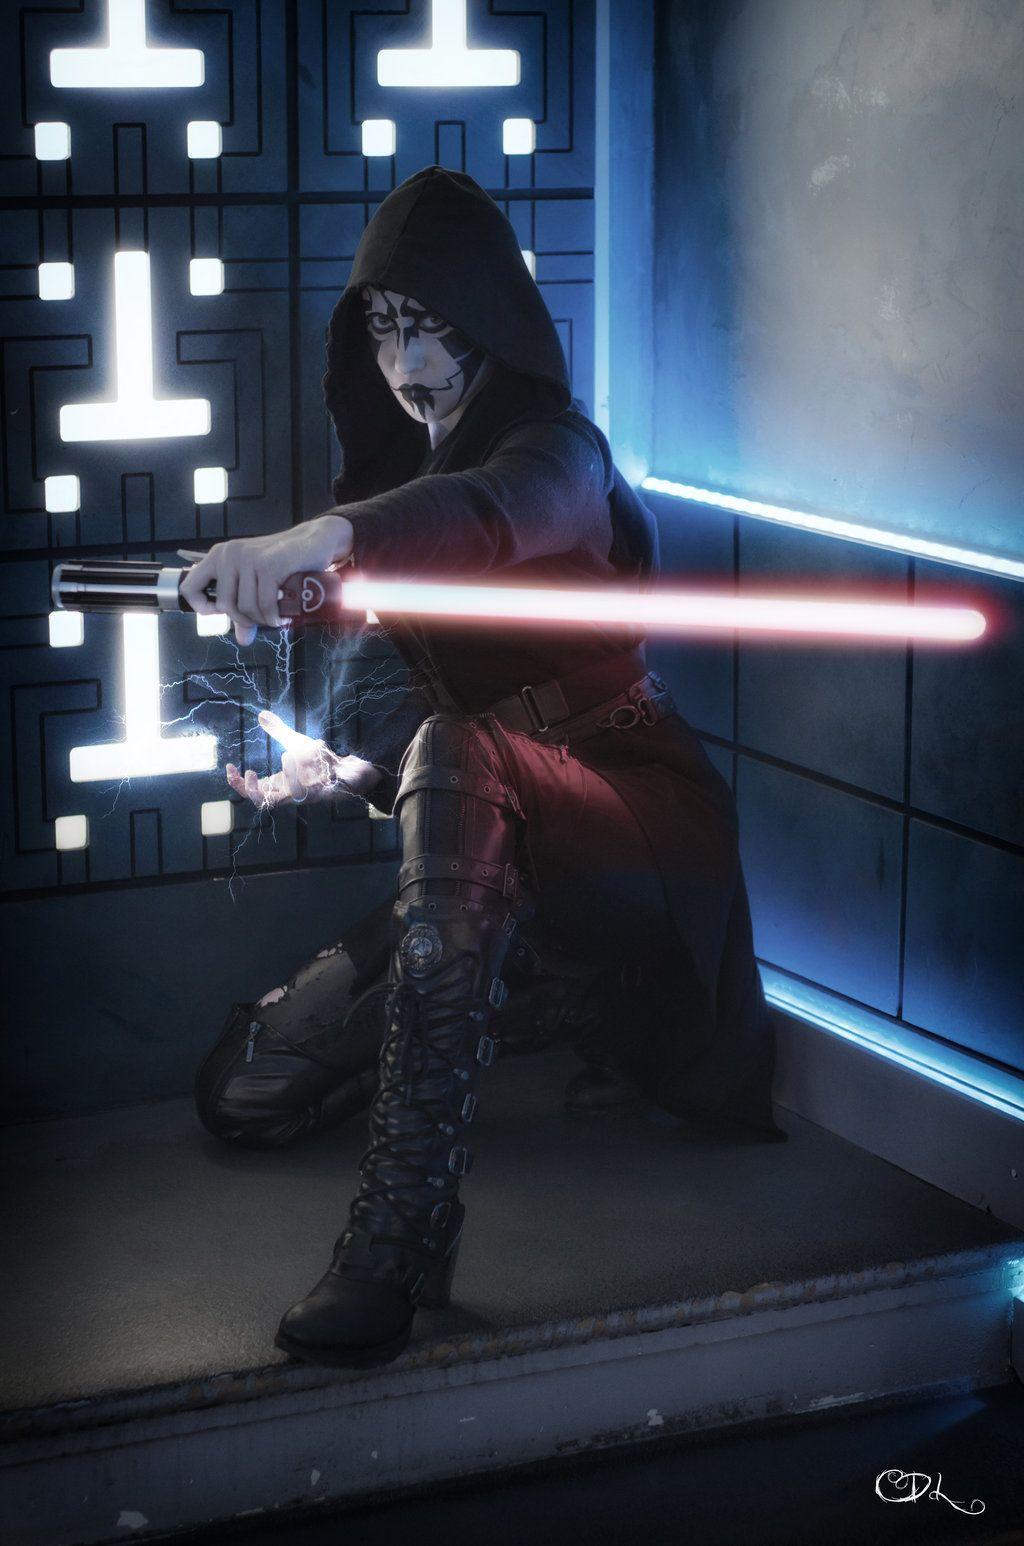 Sith Lord by PsCoTiK.deviantart.com on @DeviantArt